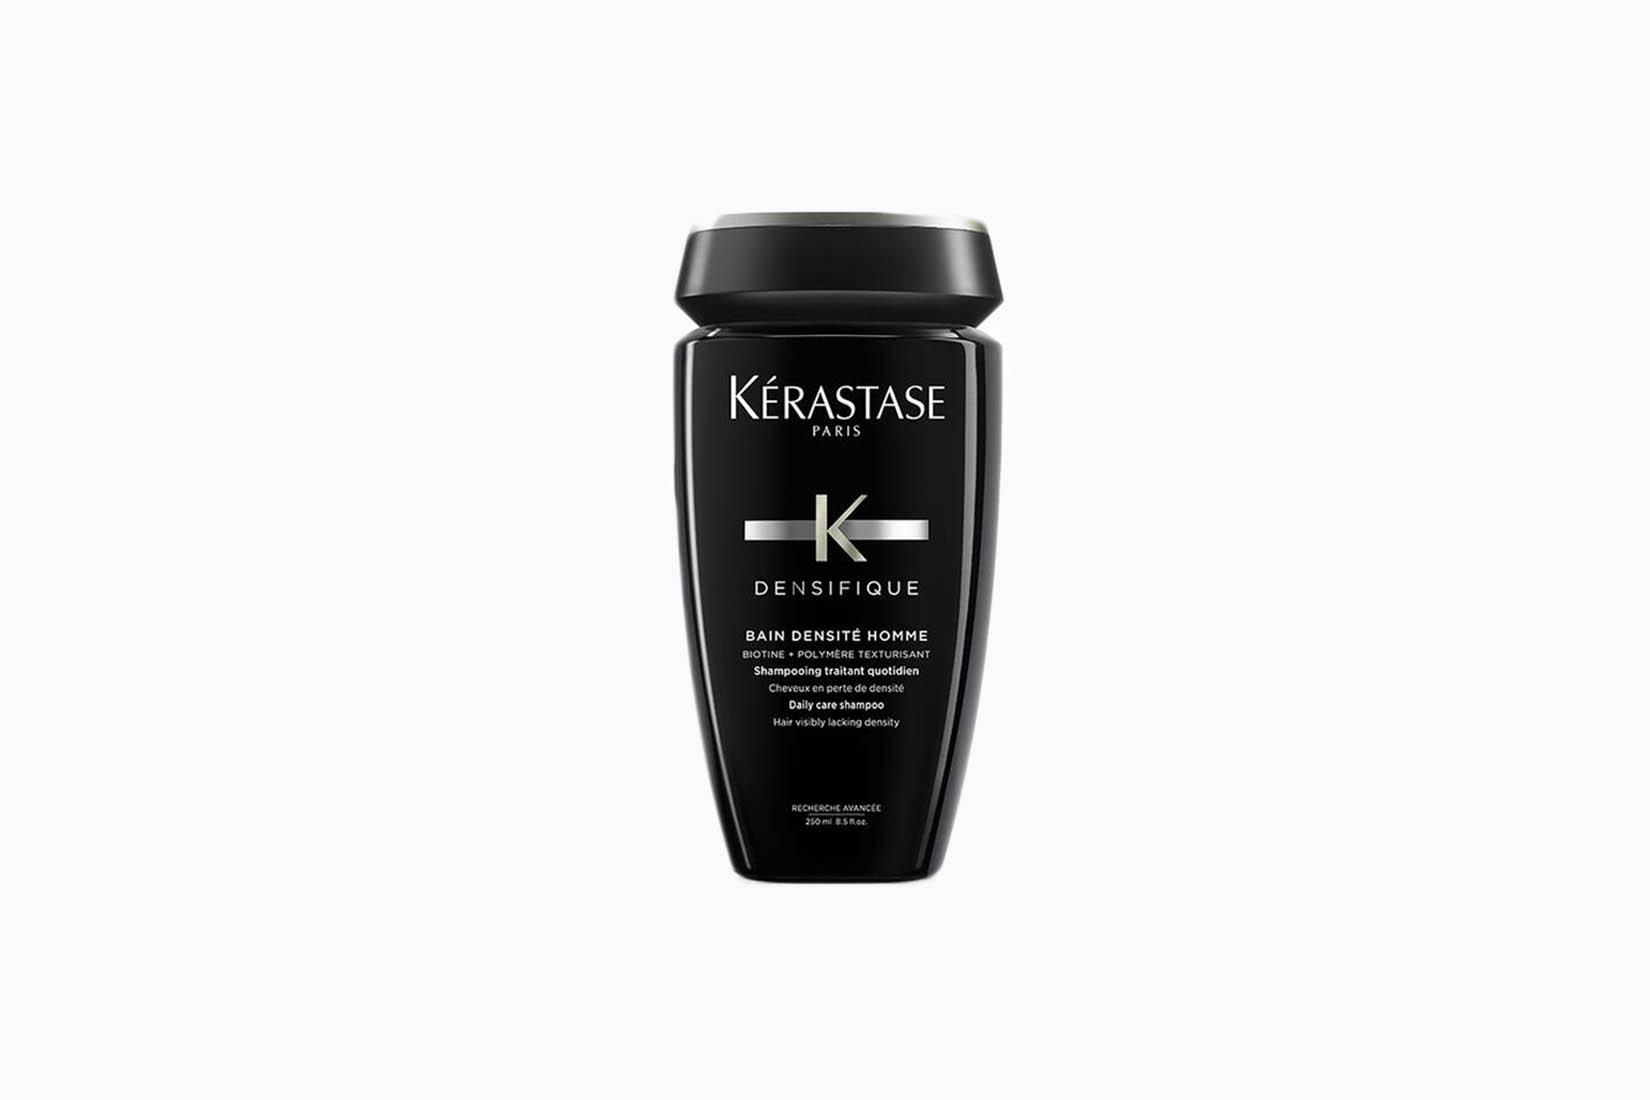 Best Hair Pura Dor Shampoo Men Kerastase Homme Review - Luxe Digital